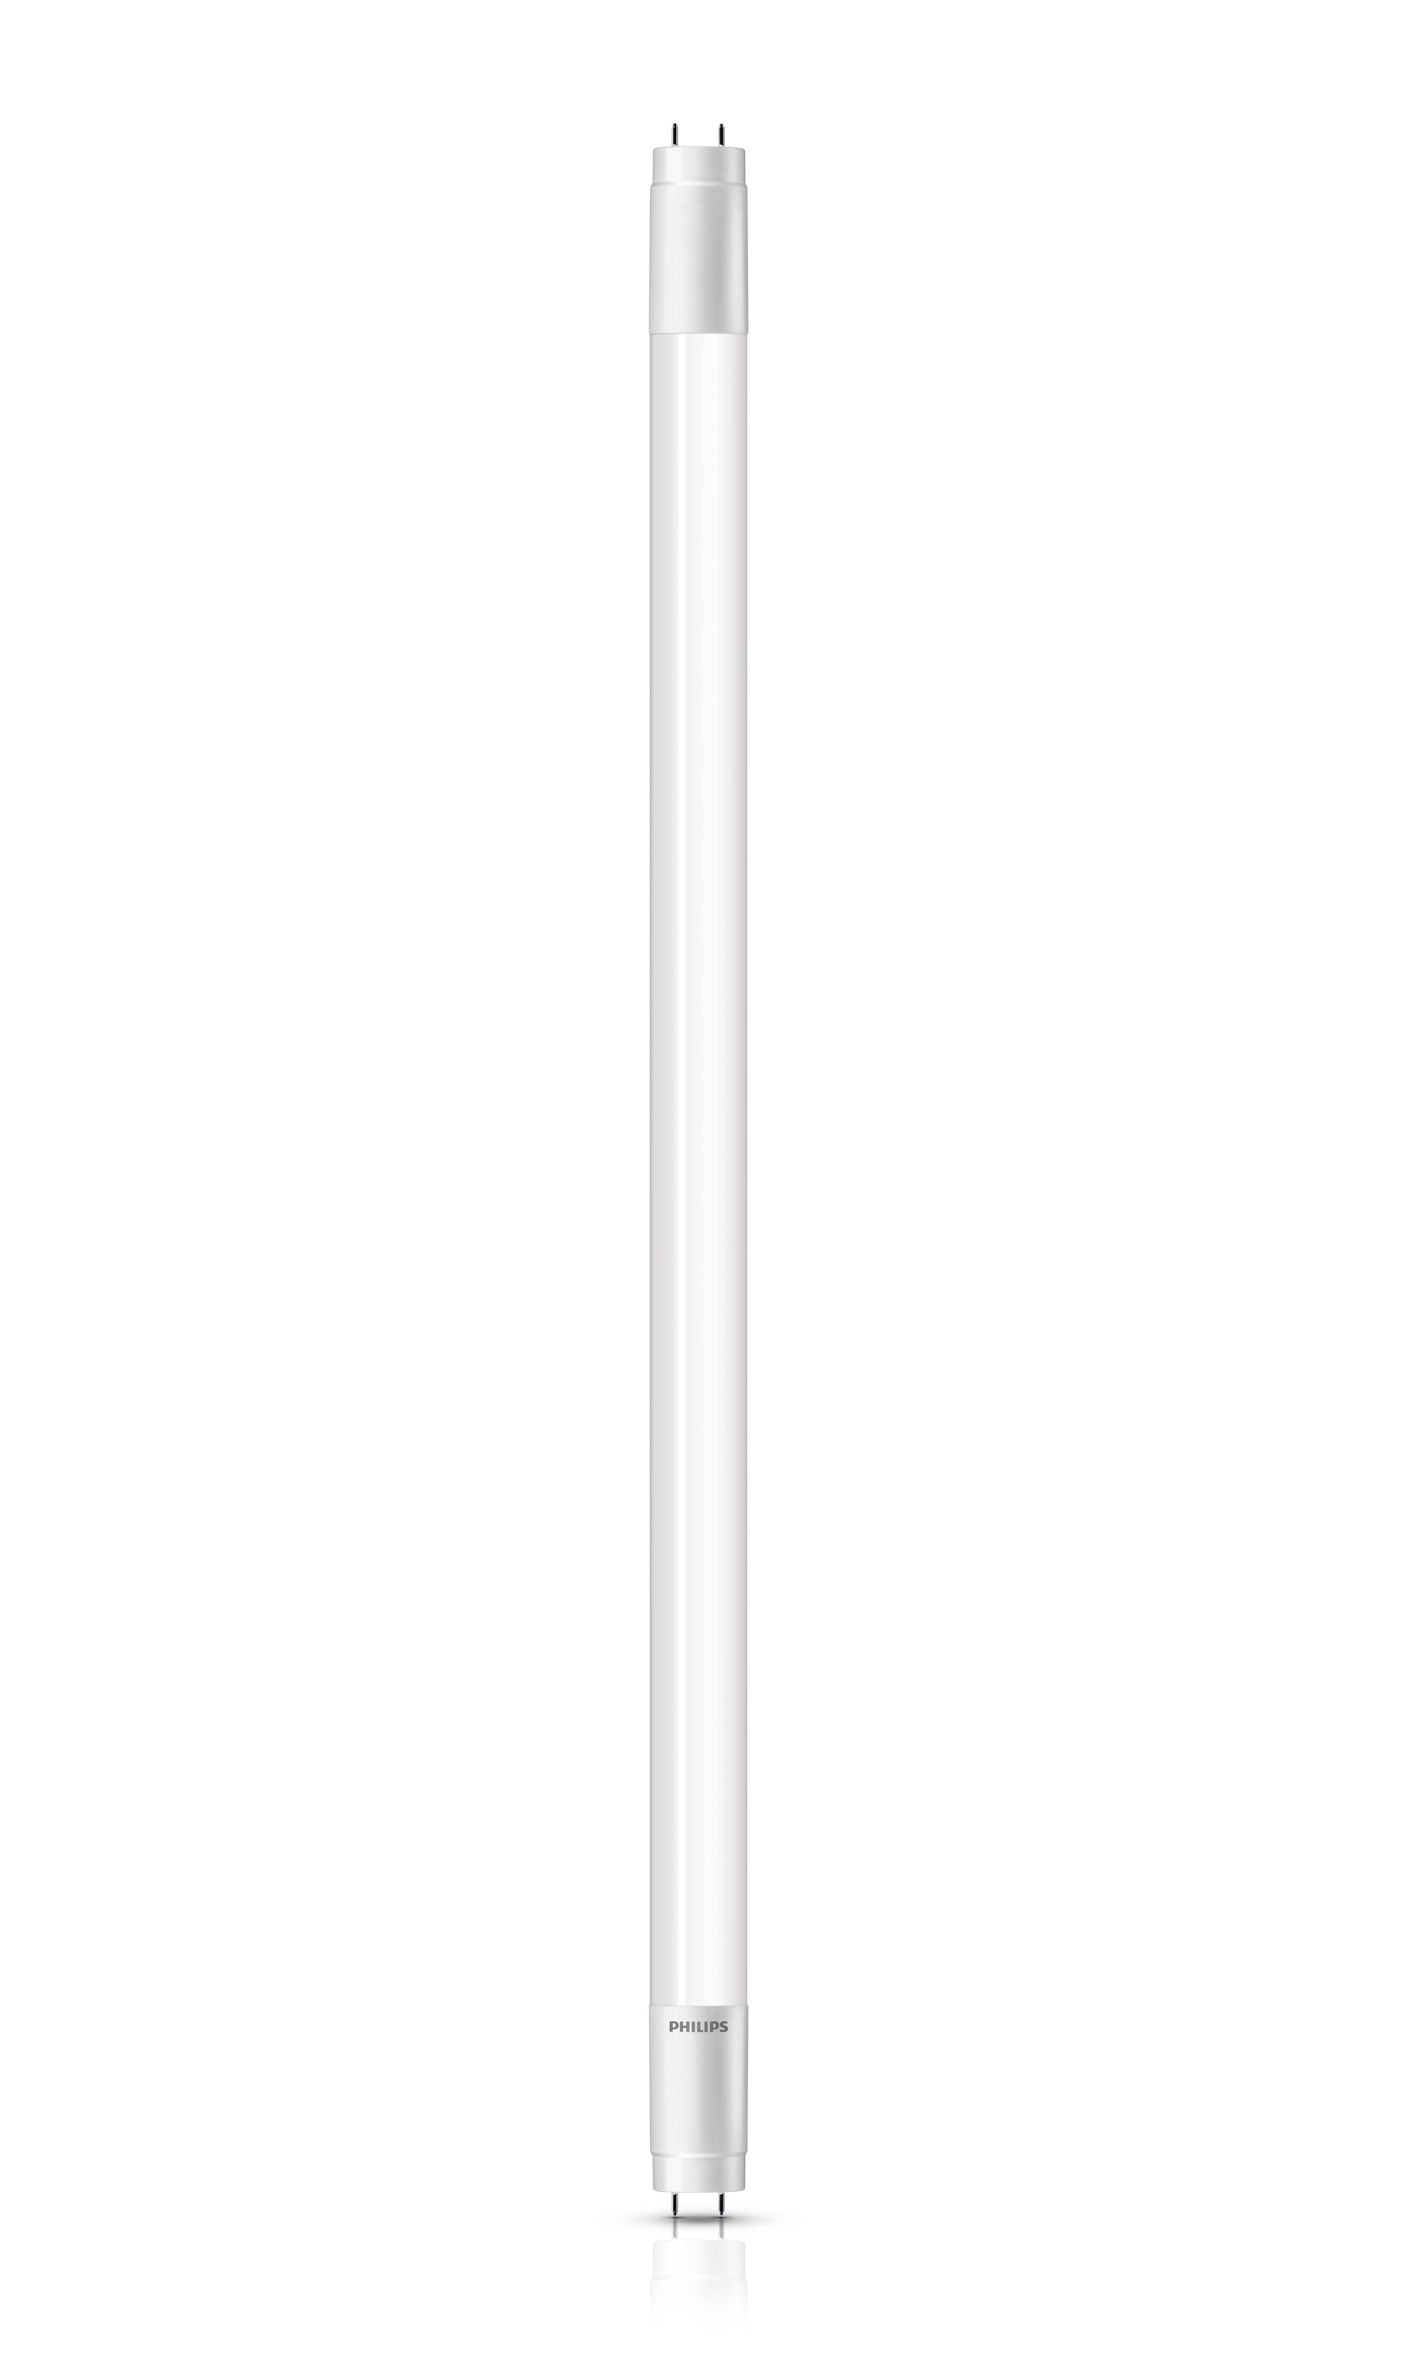 Philips LED Leuchtstofflampe T8 G13 10 Watt L 600mm Bild 1